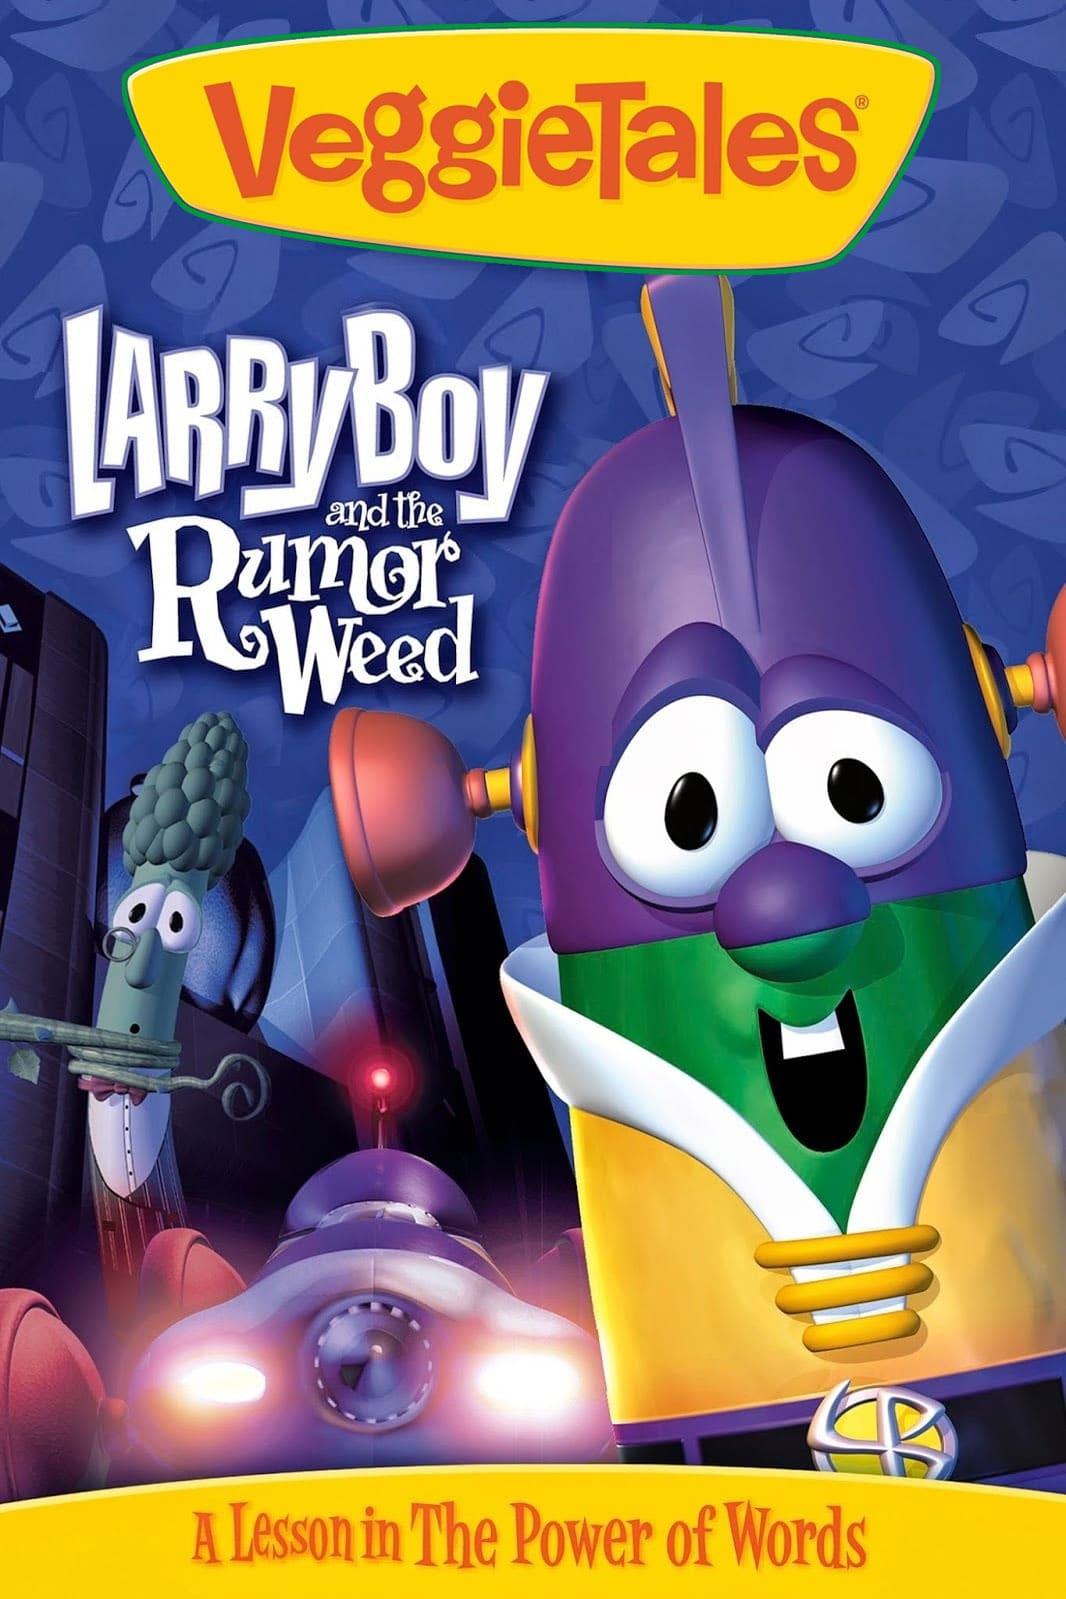 VeggieTales: Larry-Boy and the Rumor Weed